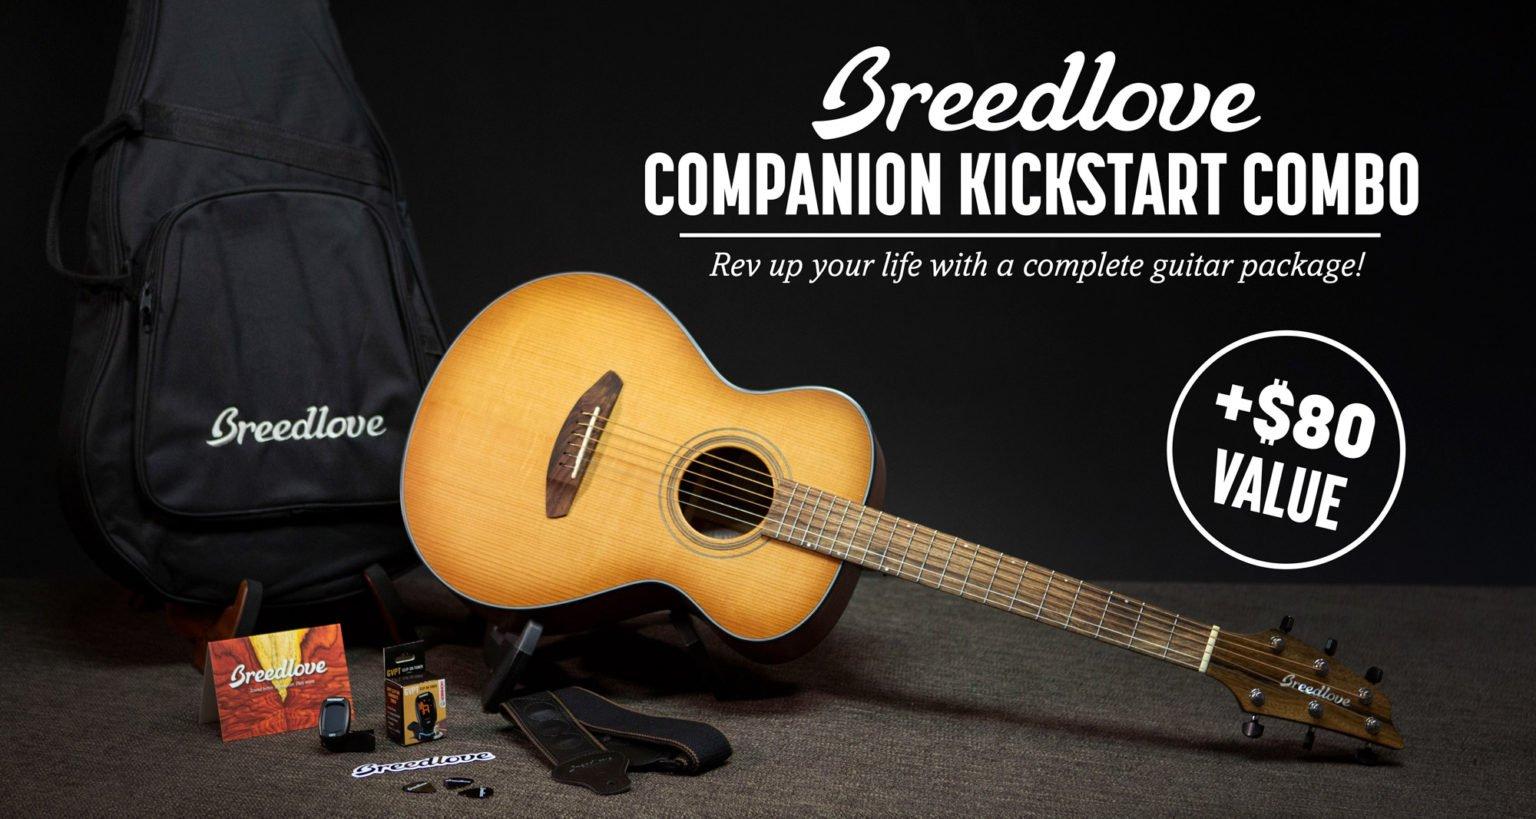 Win this Breedlove Companion Kickstart Combo!